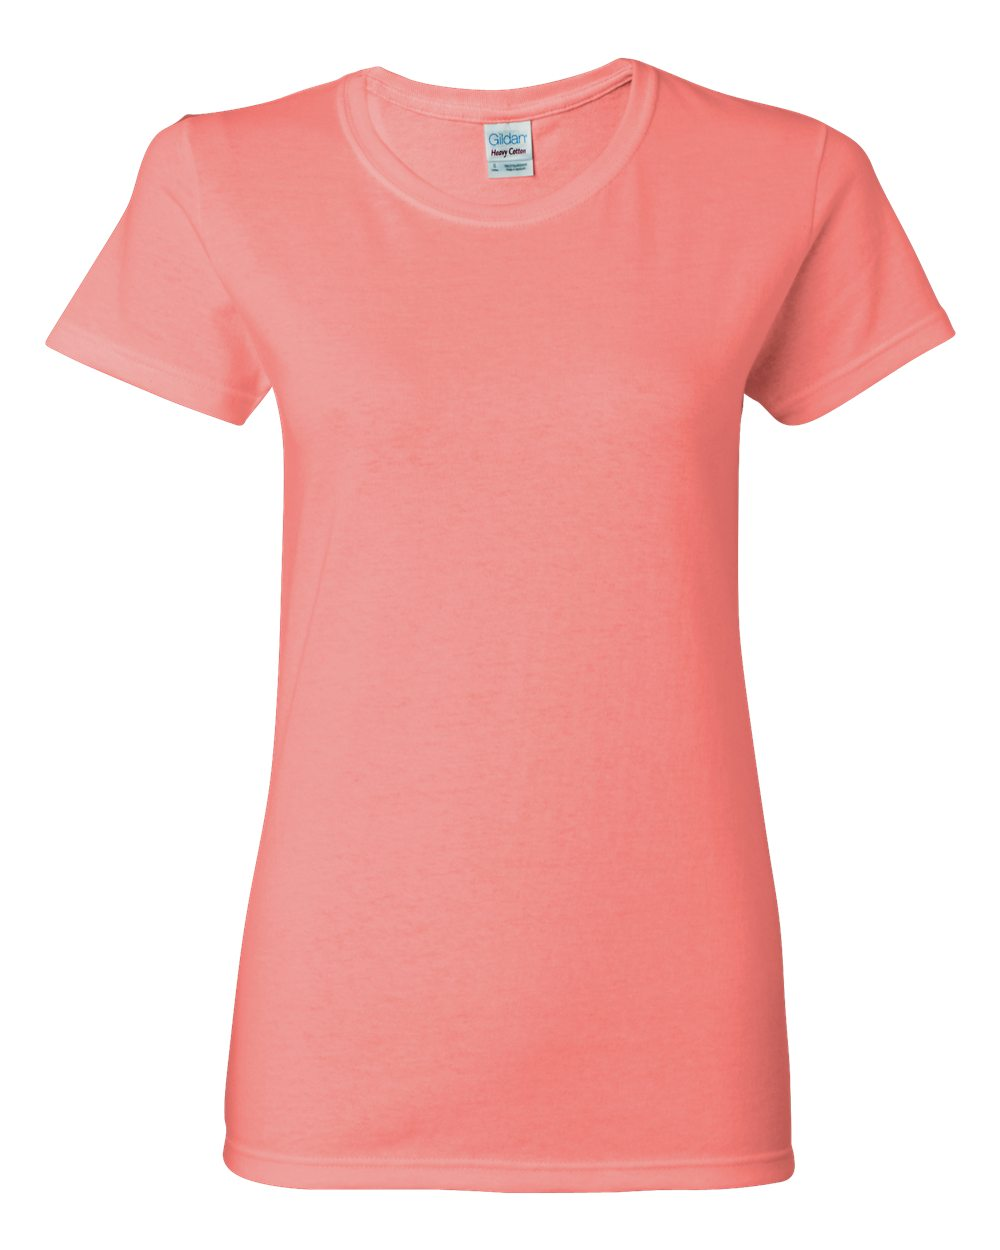 Ladies gildan 100 heavy cotton t shirt item 5000l big for Diamond and silk t shirts